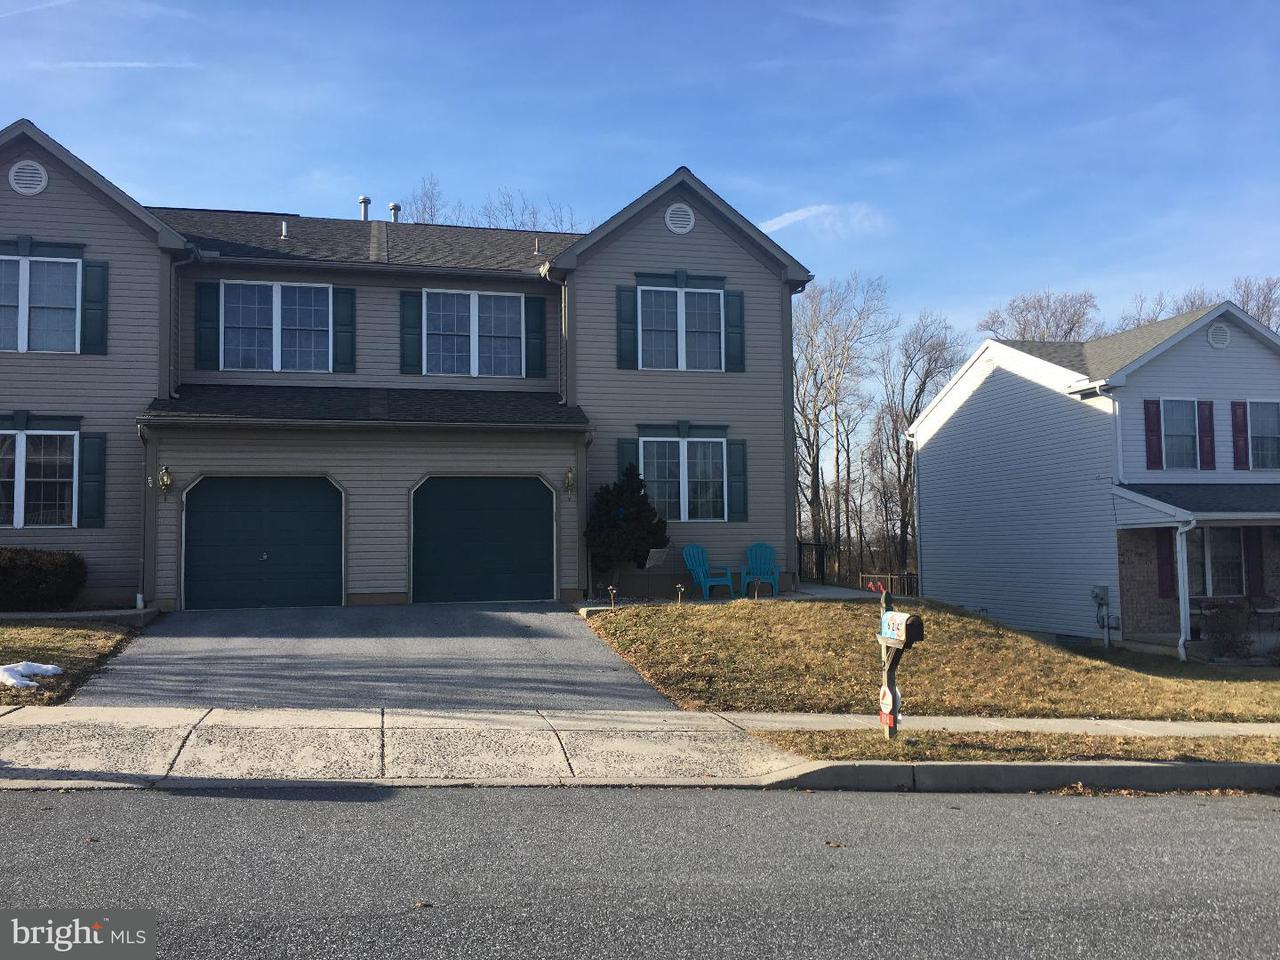 Casa unifamiliar adosada (Townhouse) por un Venta en 624 FREDERICK Street Reading, Pennsylvania 19608 Estados Unidos